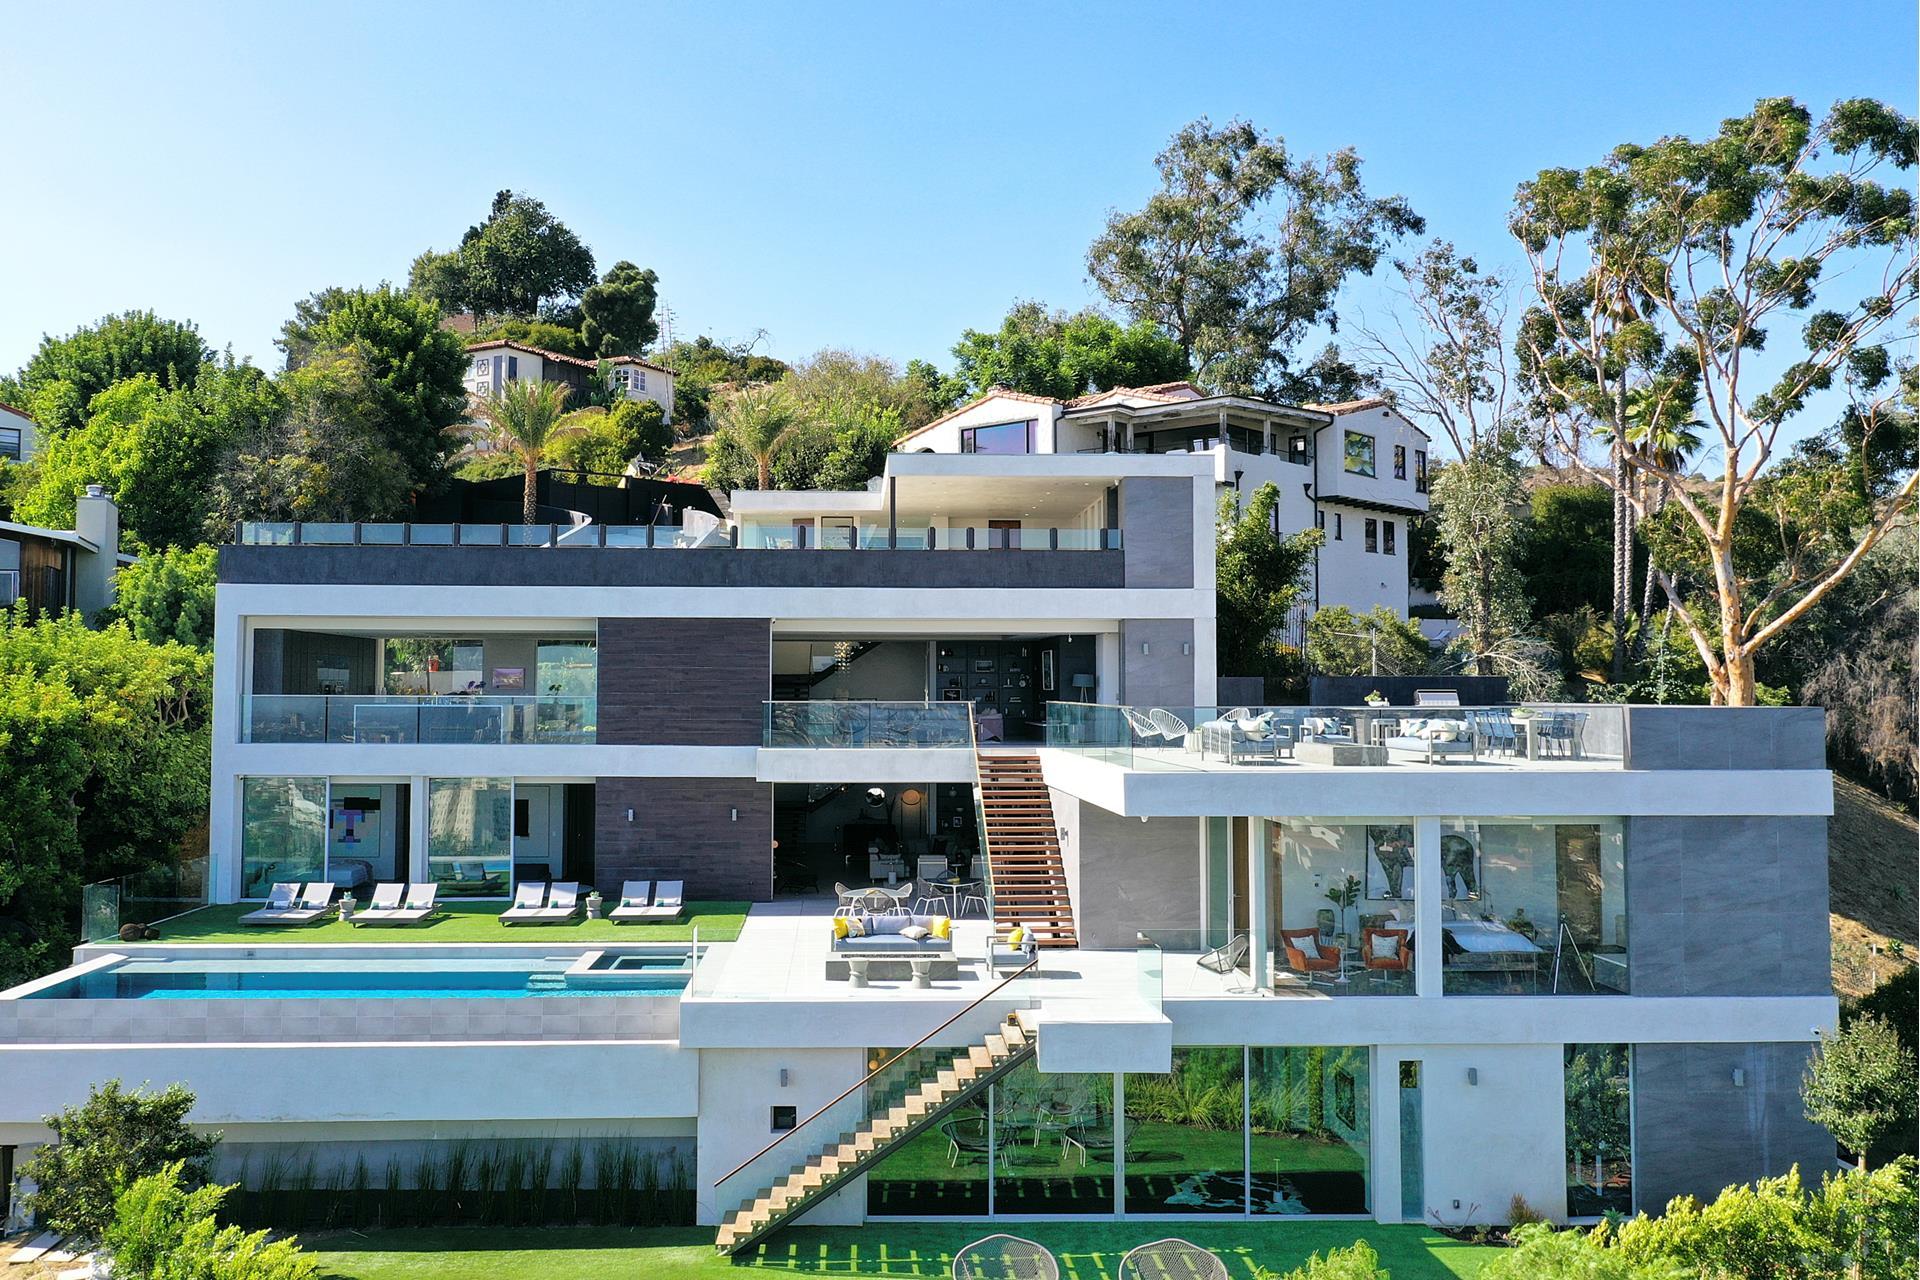 6902 LOS TILOS Road - Sunset Strip / Hollywood Hills West, California